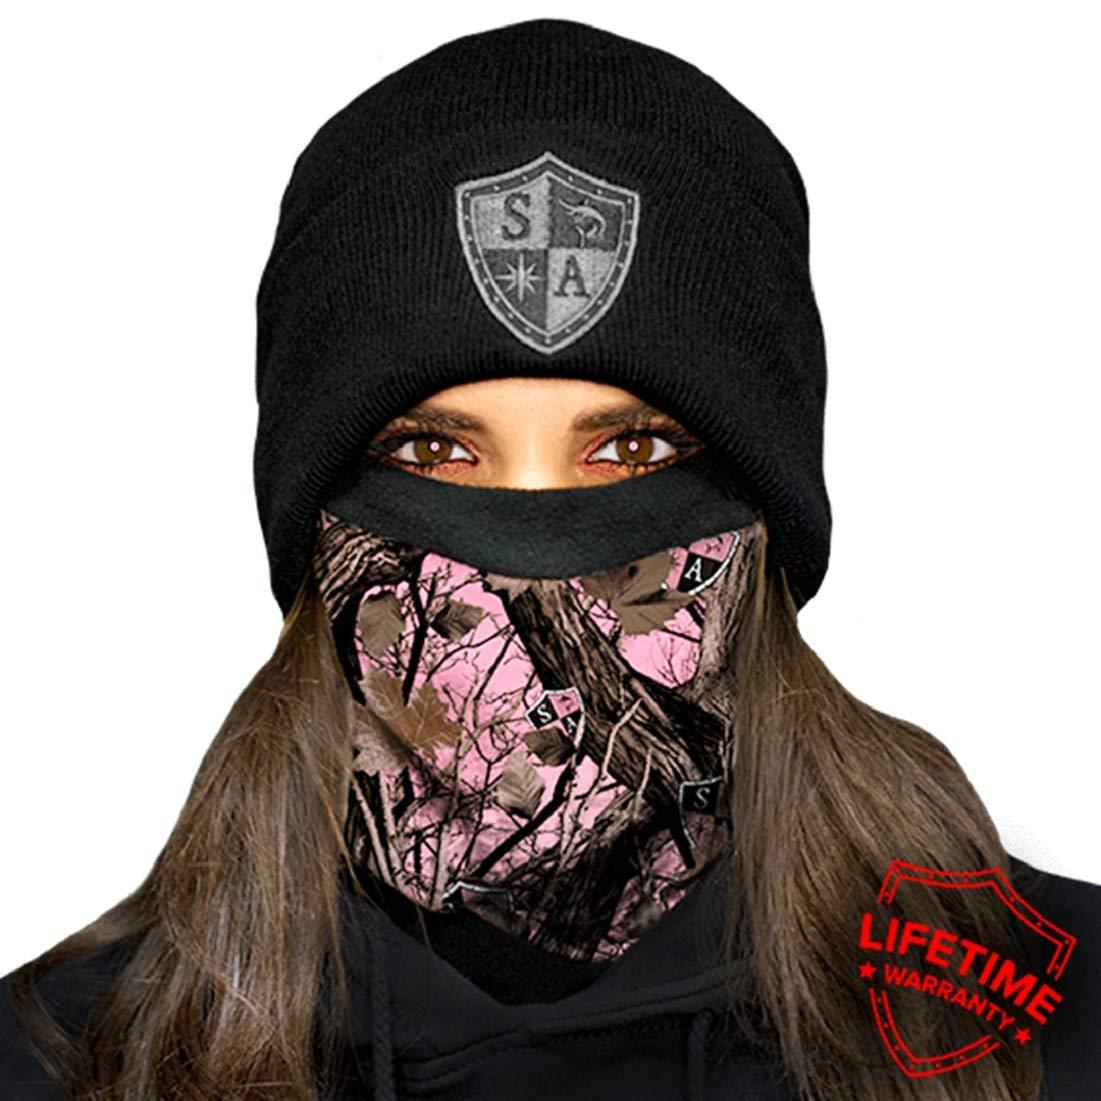 Salt Armour SA Forest Camo Skull Face Shield Sun Mask Neck Gaiter *USA*